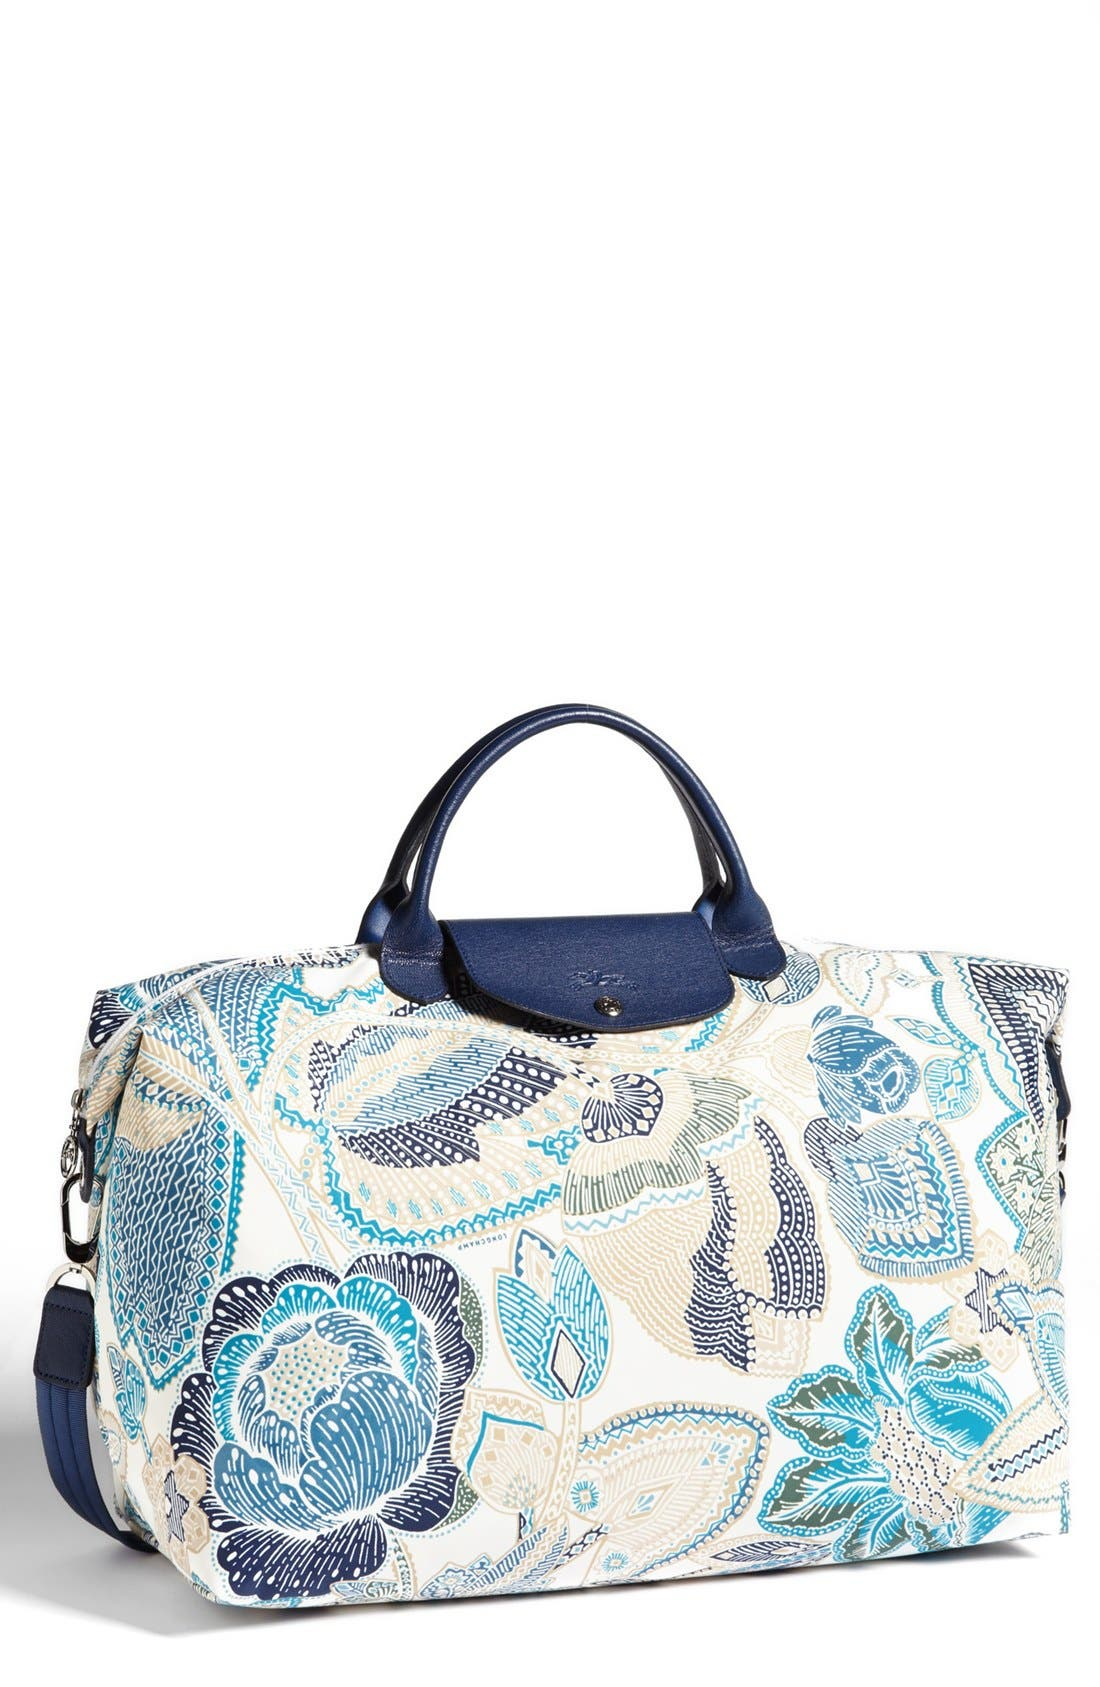 Main Image - Longchamp 'Fleurs de Ravello' Travel Bag